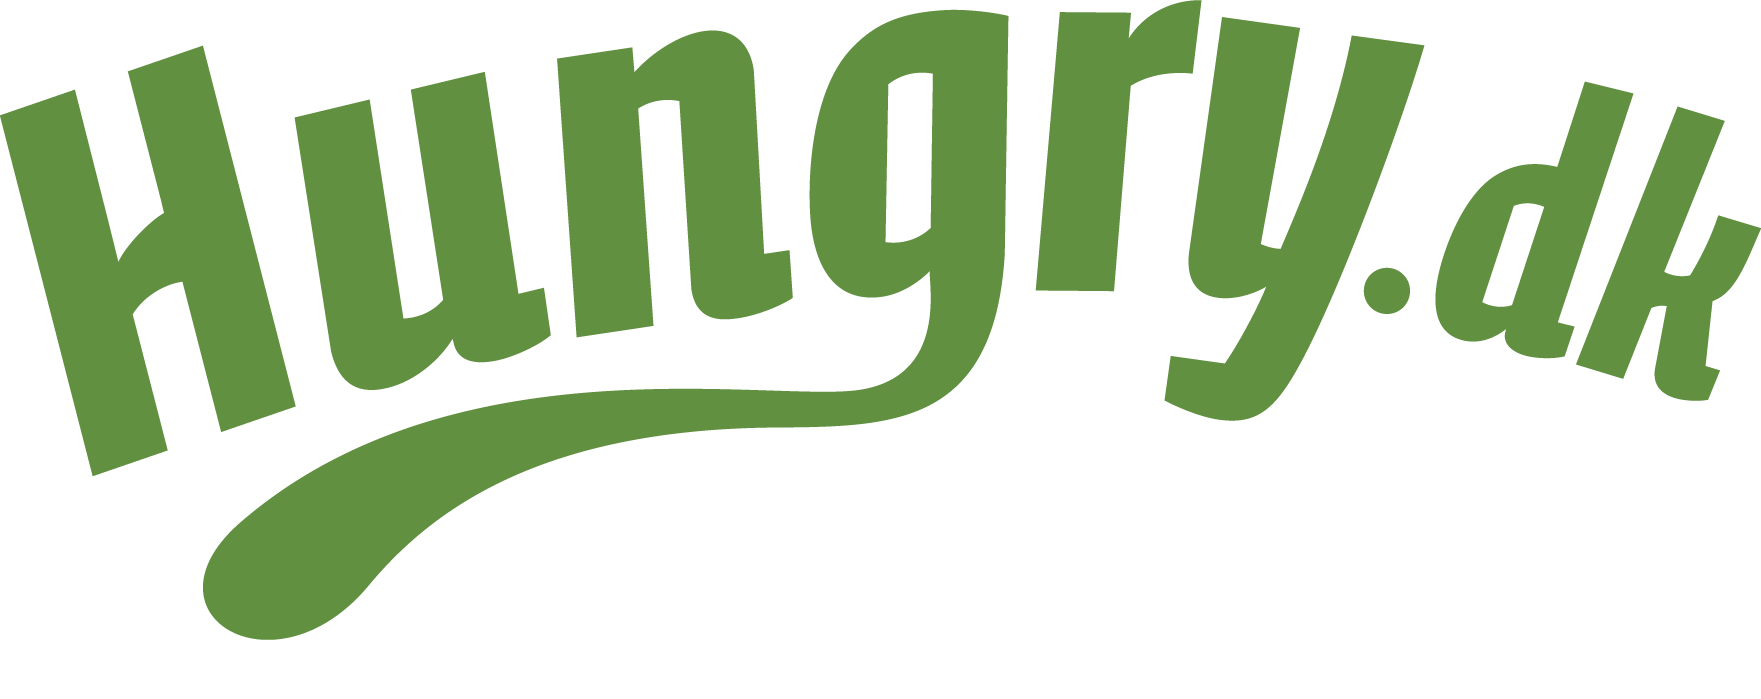 hungry-dk-logo-green